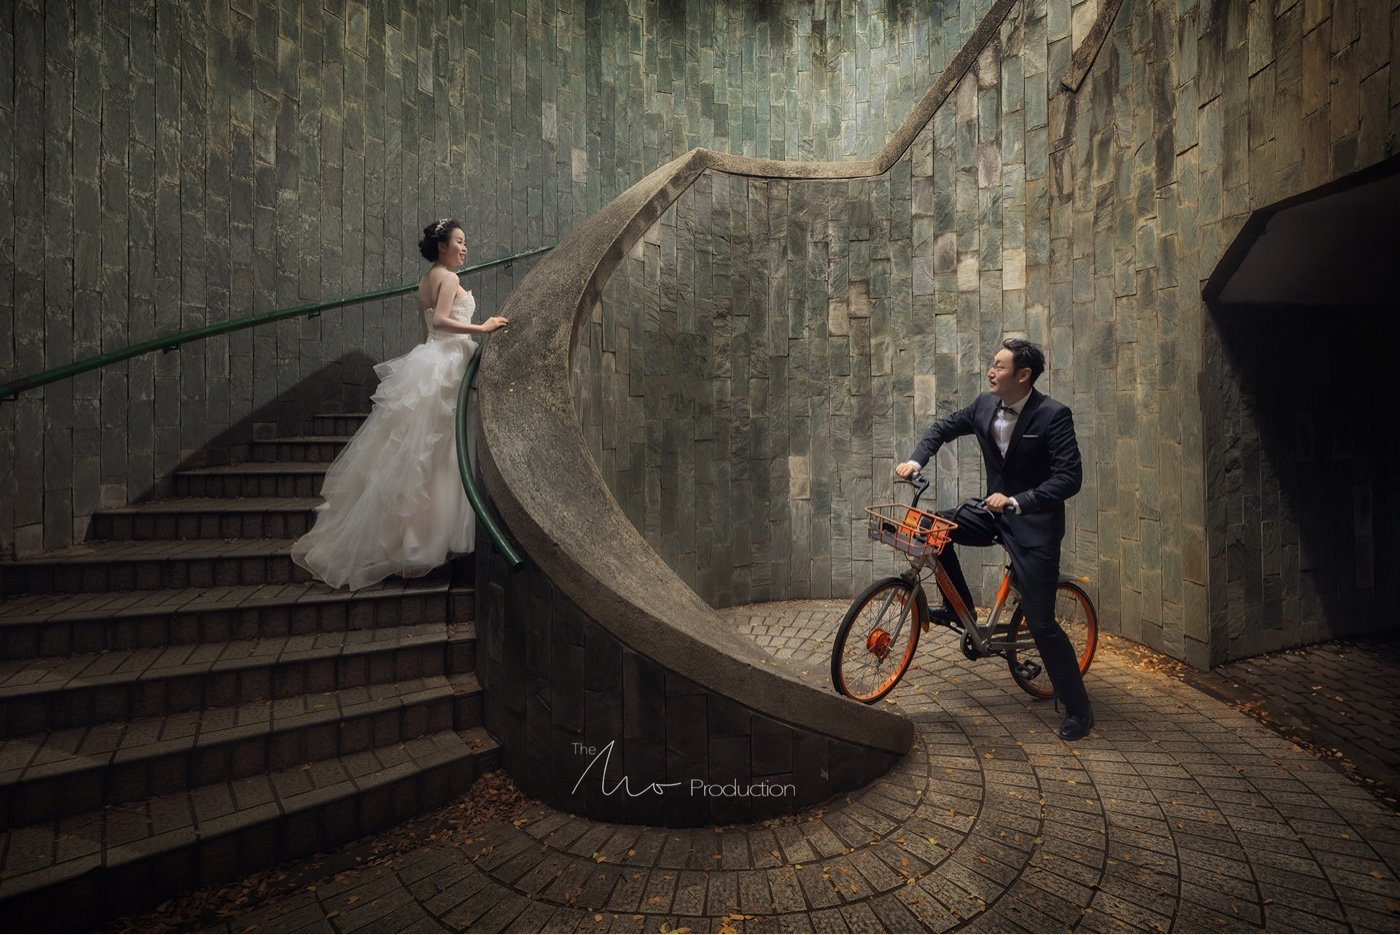 MoFoTo | 新加坡旅拍婚纱5